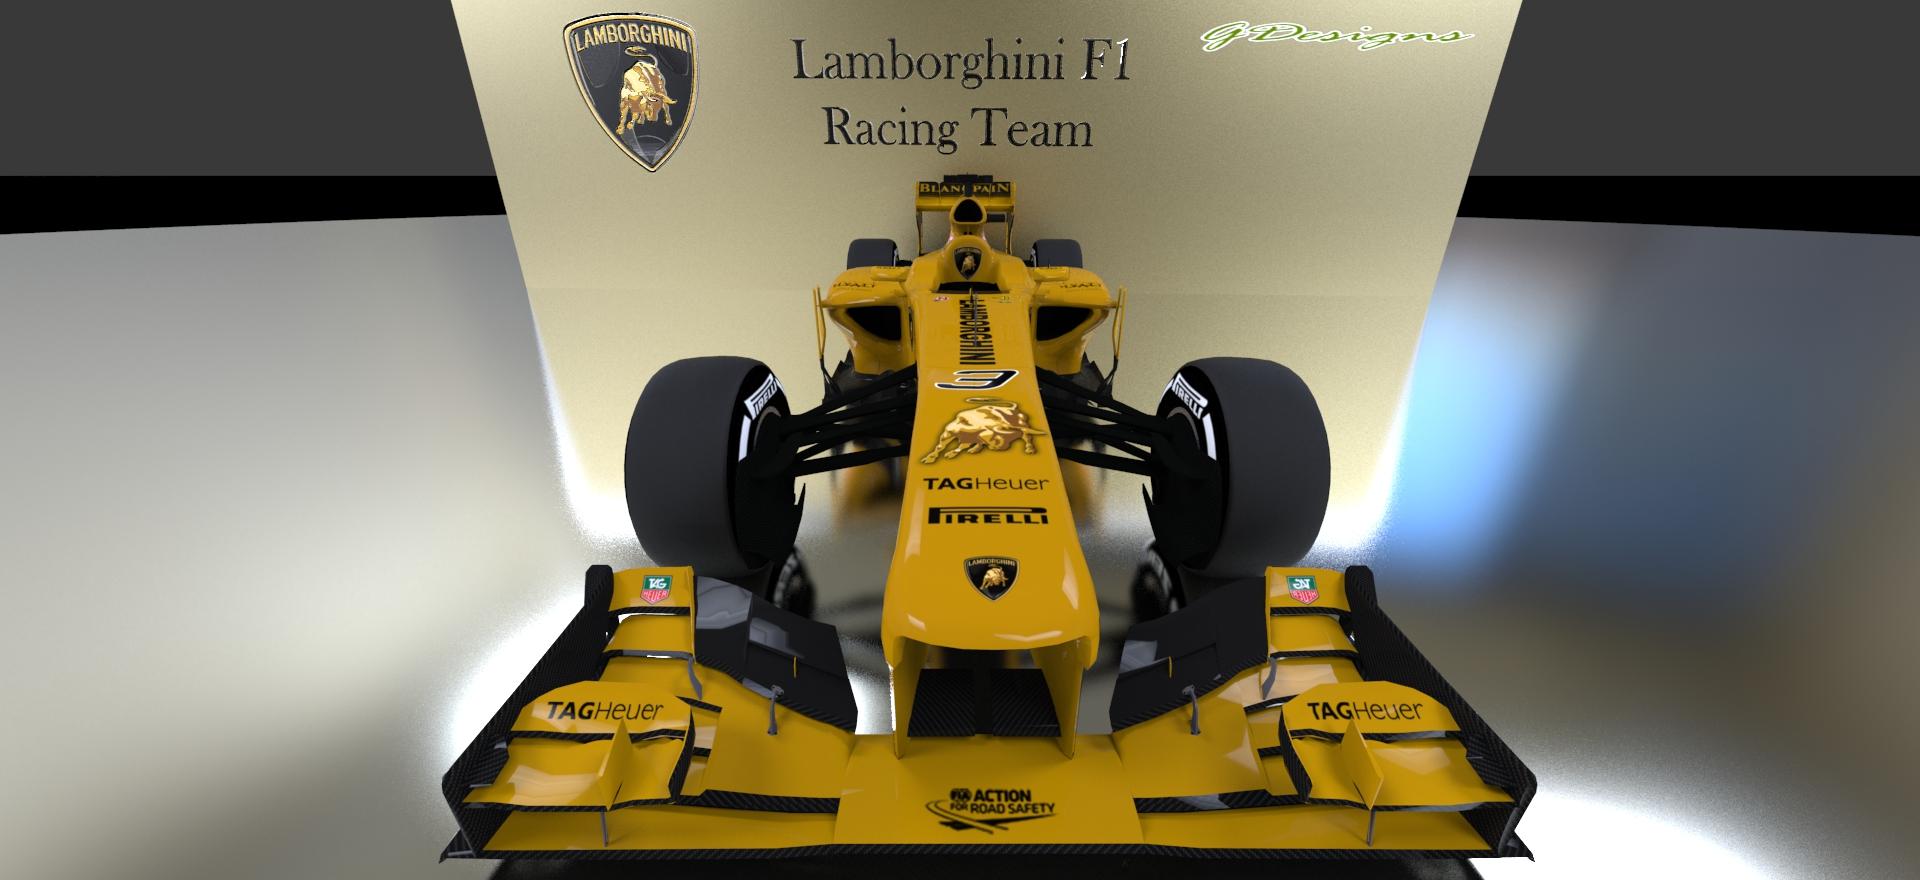 Lamborghini F1 Dhd Racedepartment Latest Formula 1 Motorsport